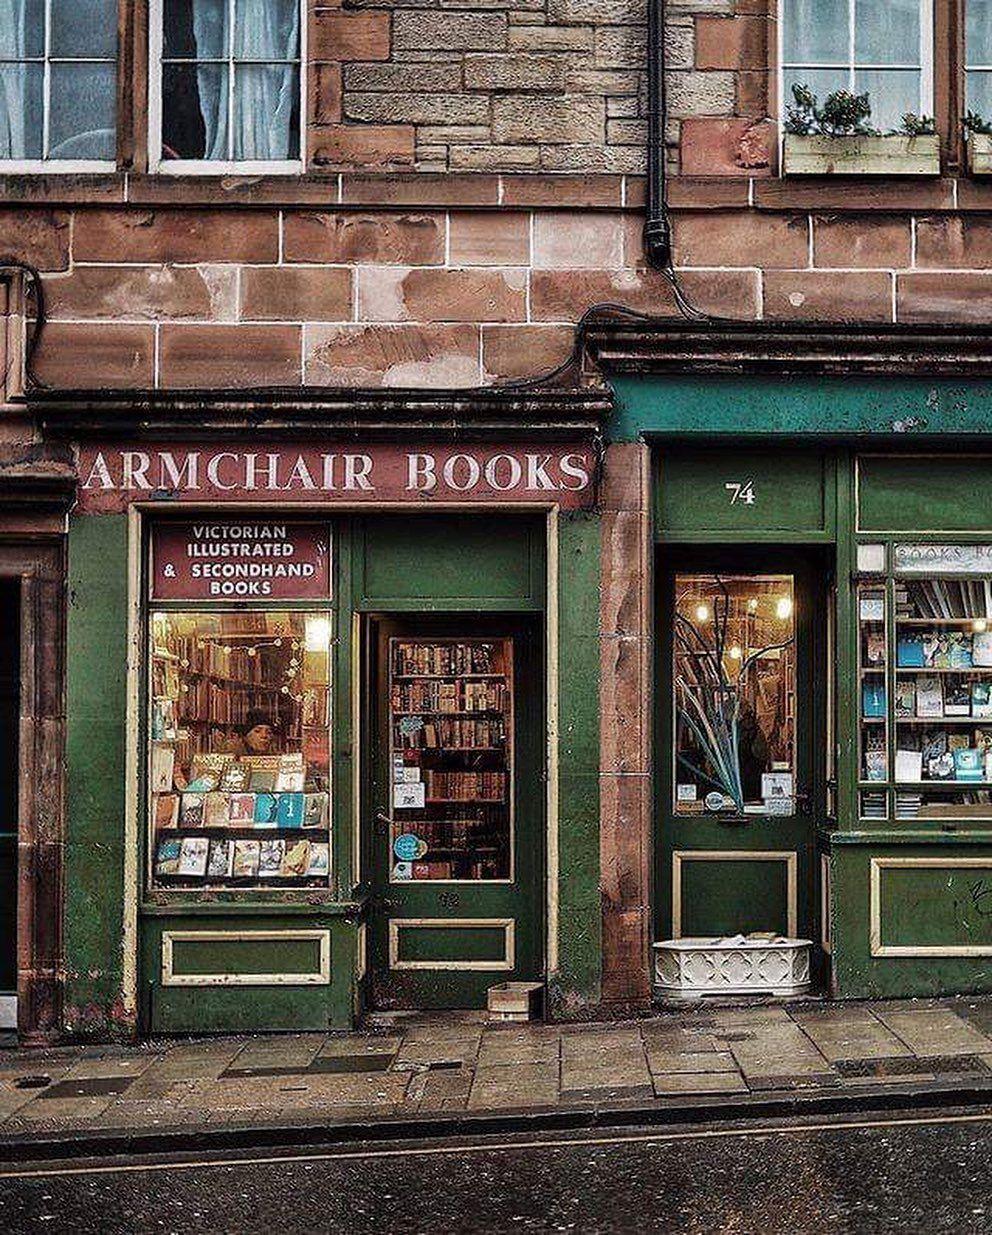 VisitScotland on Twitter: